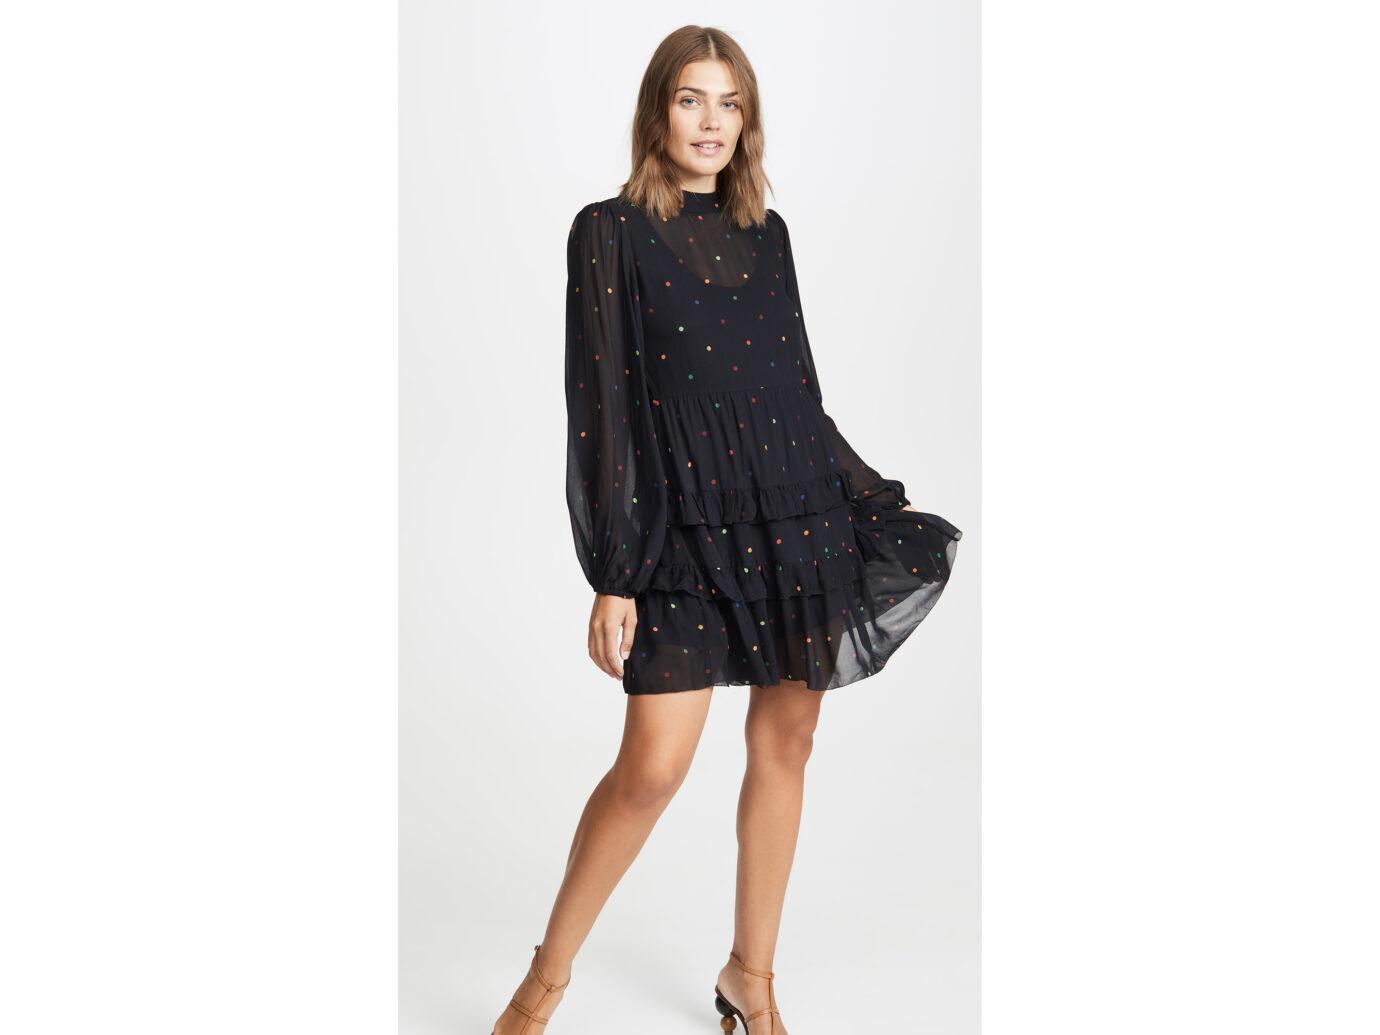 FARM Rio Black Dots Mini Dress